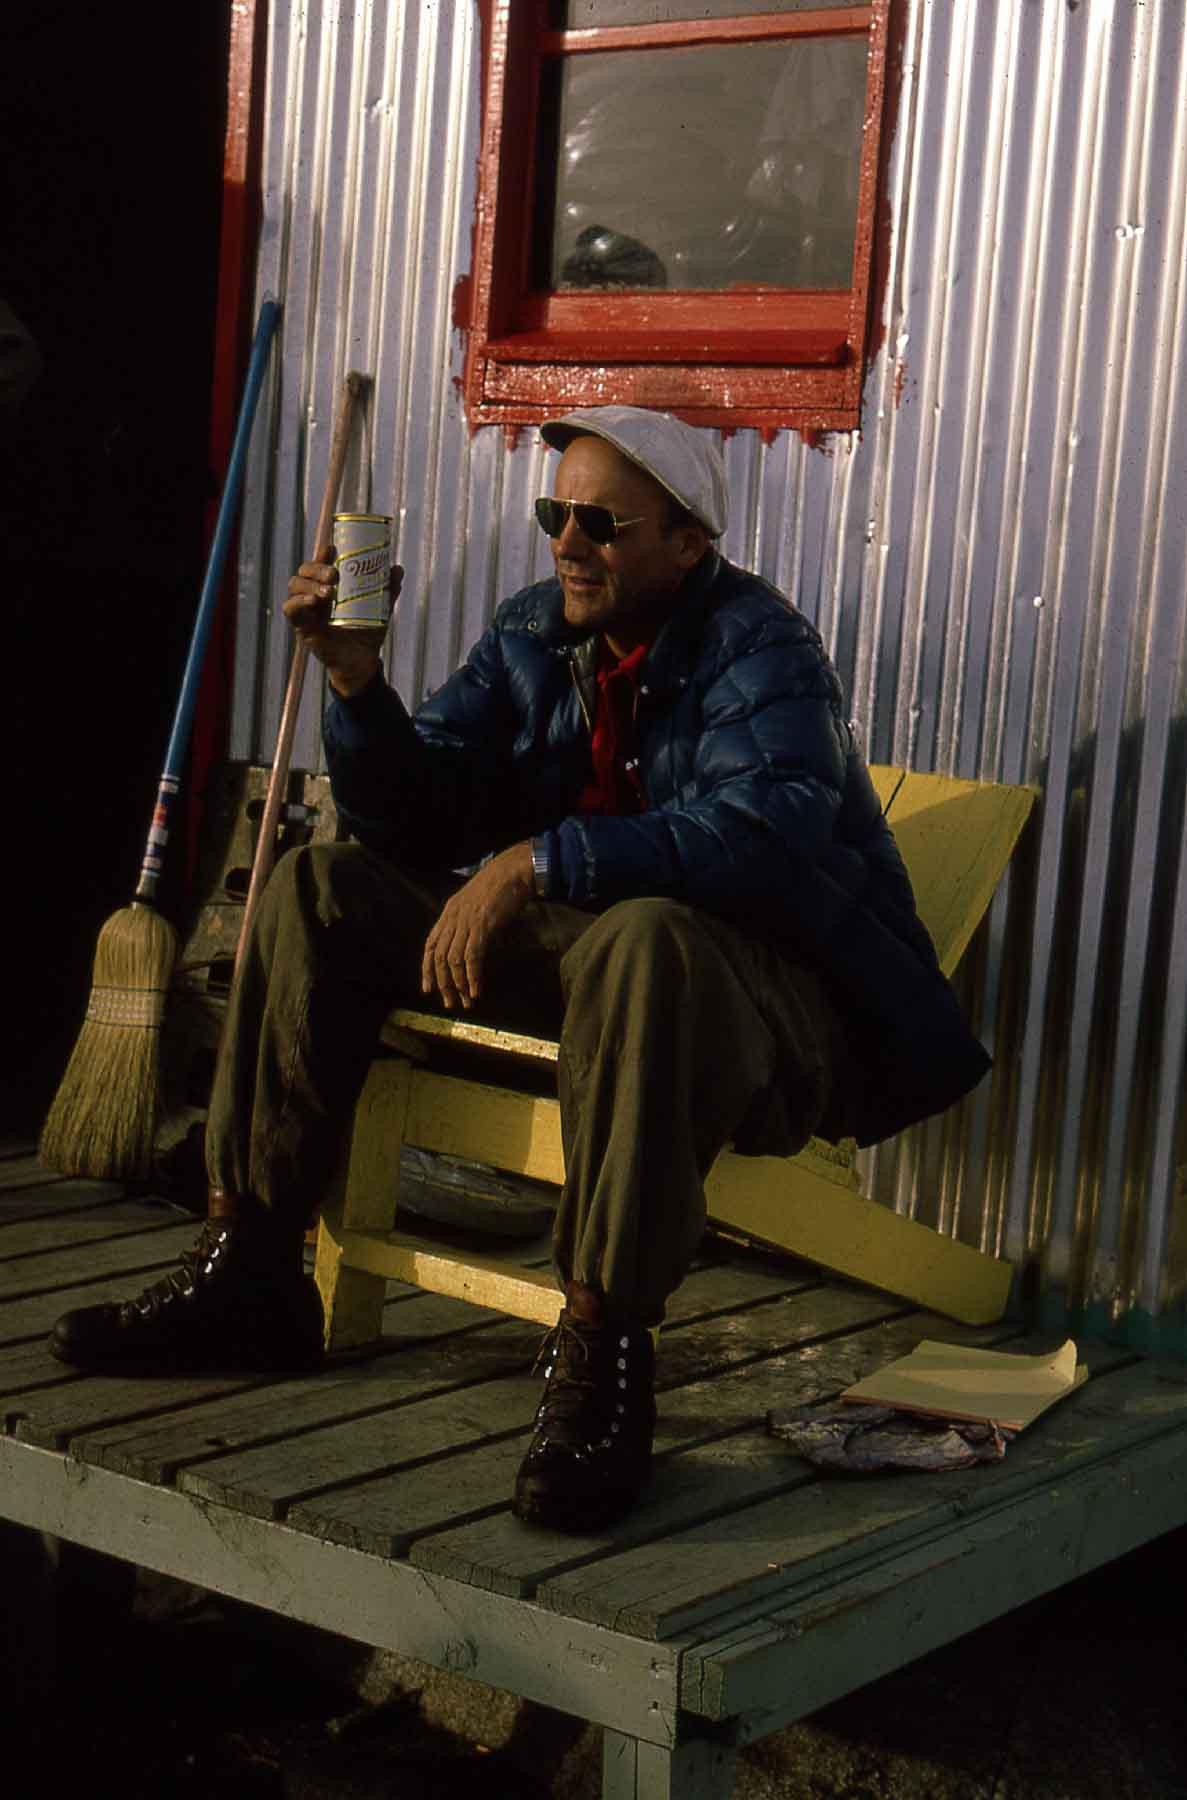 Maynard Miller, Camp 10, Taku Glacier, 1966